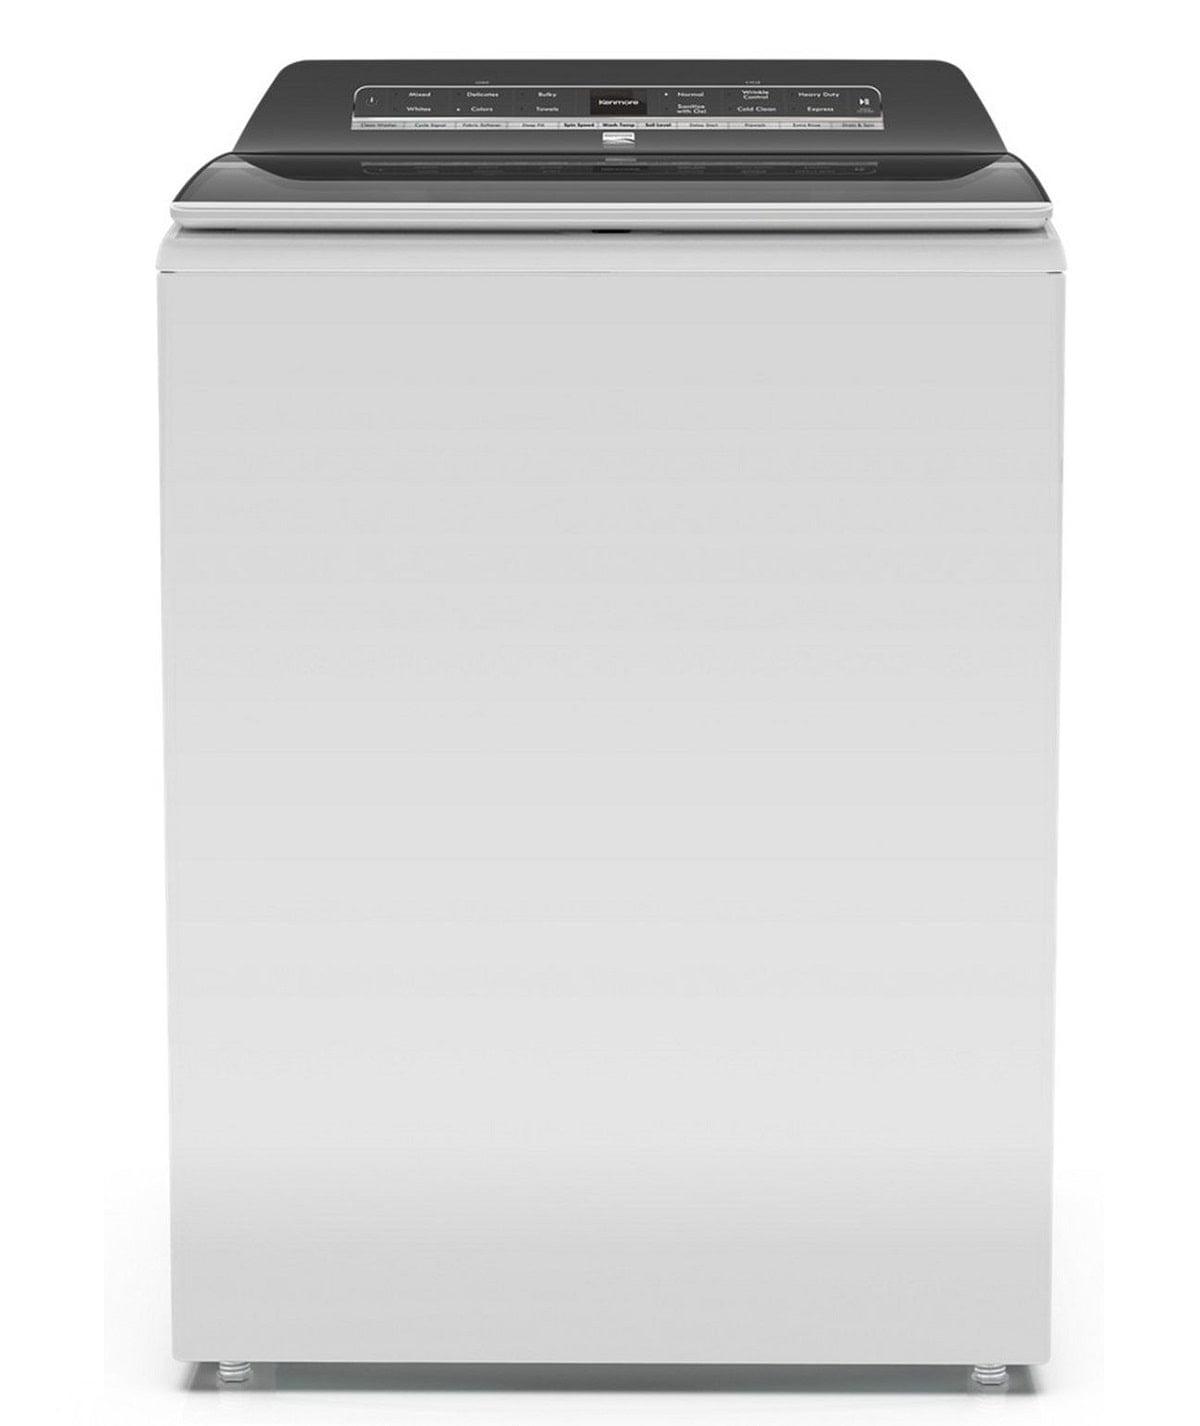 Kenmore 21112 Washing Machine